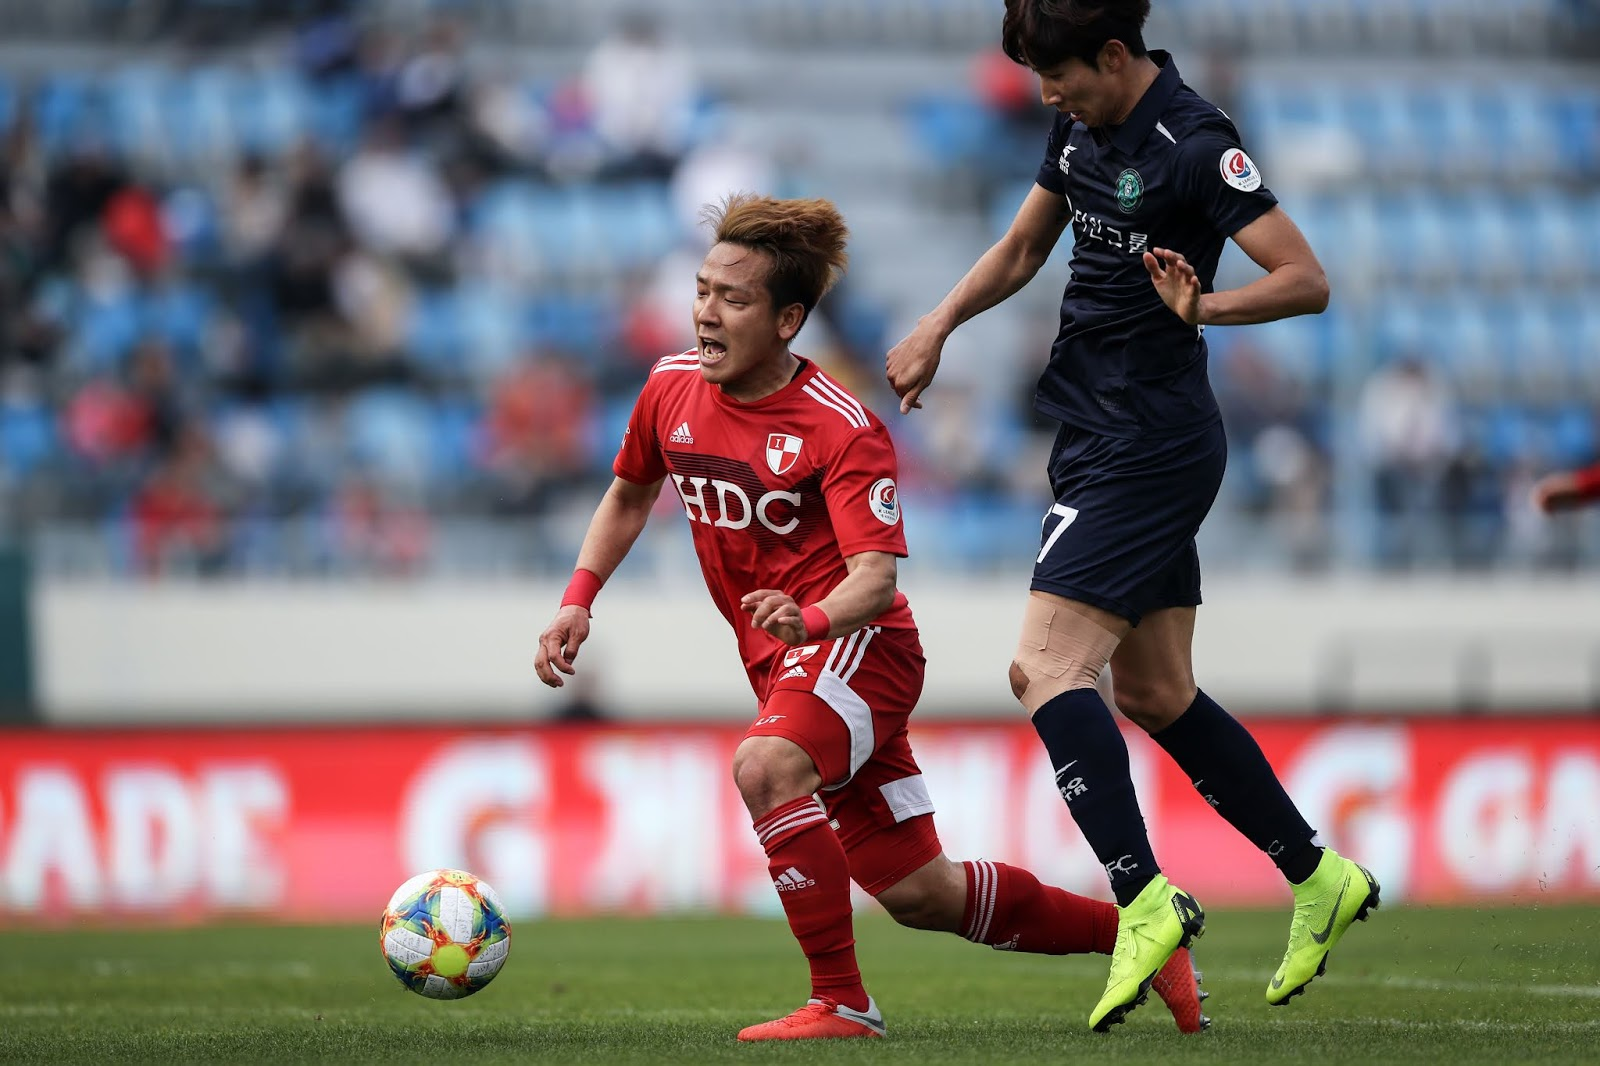 K League 2 Preview: Busan IPark vs Seoul E-Land